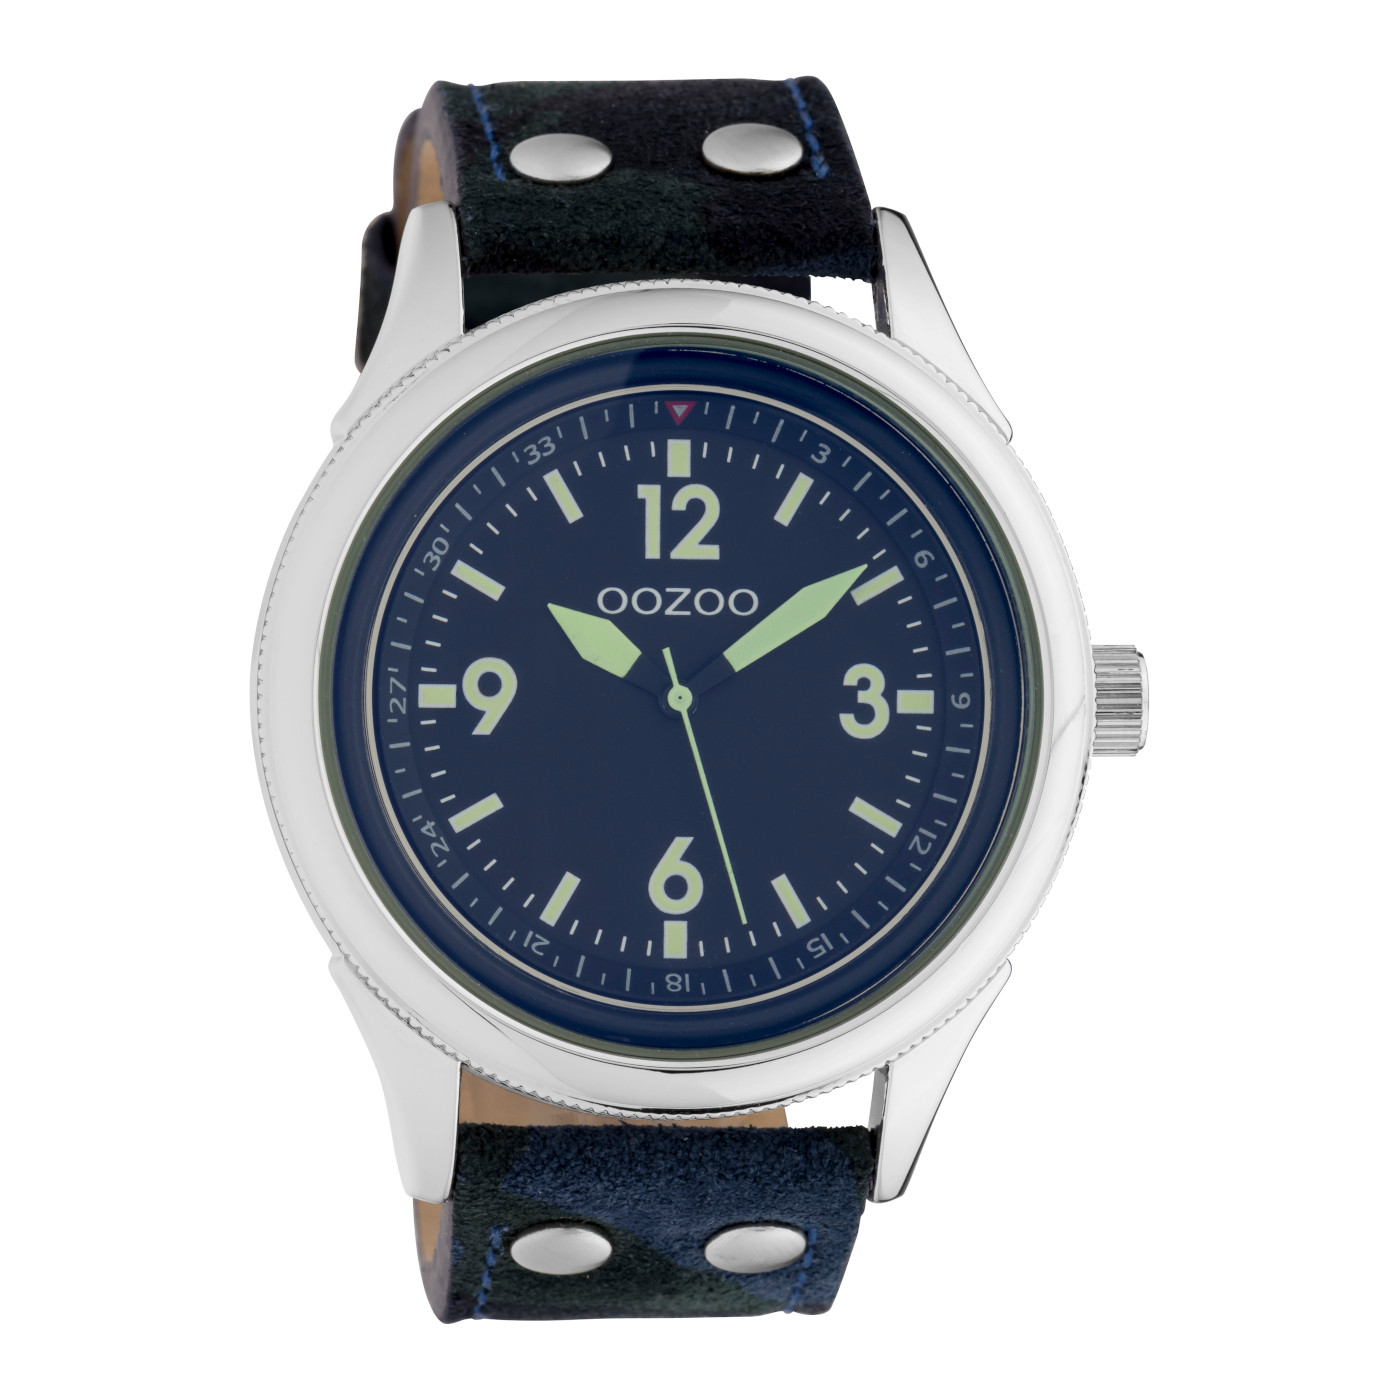 OOZOO Timepieces Camouflage/Blauw horloge C10350 (48 mm)